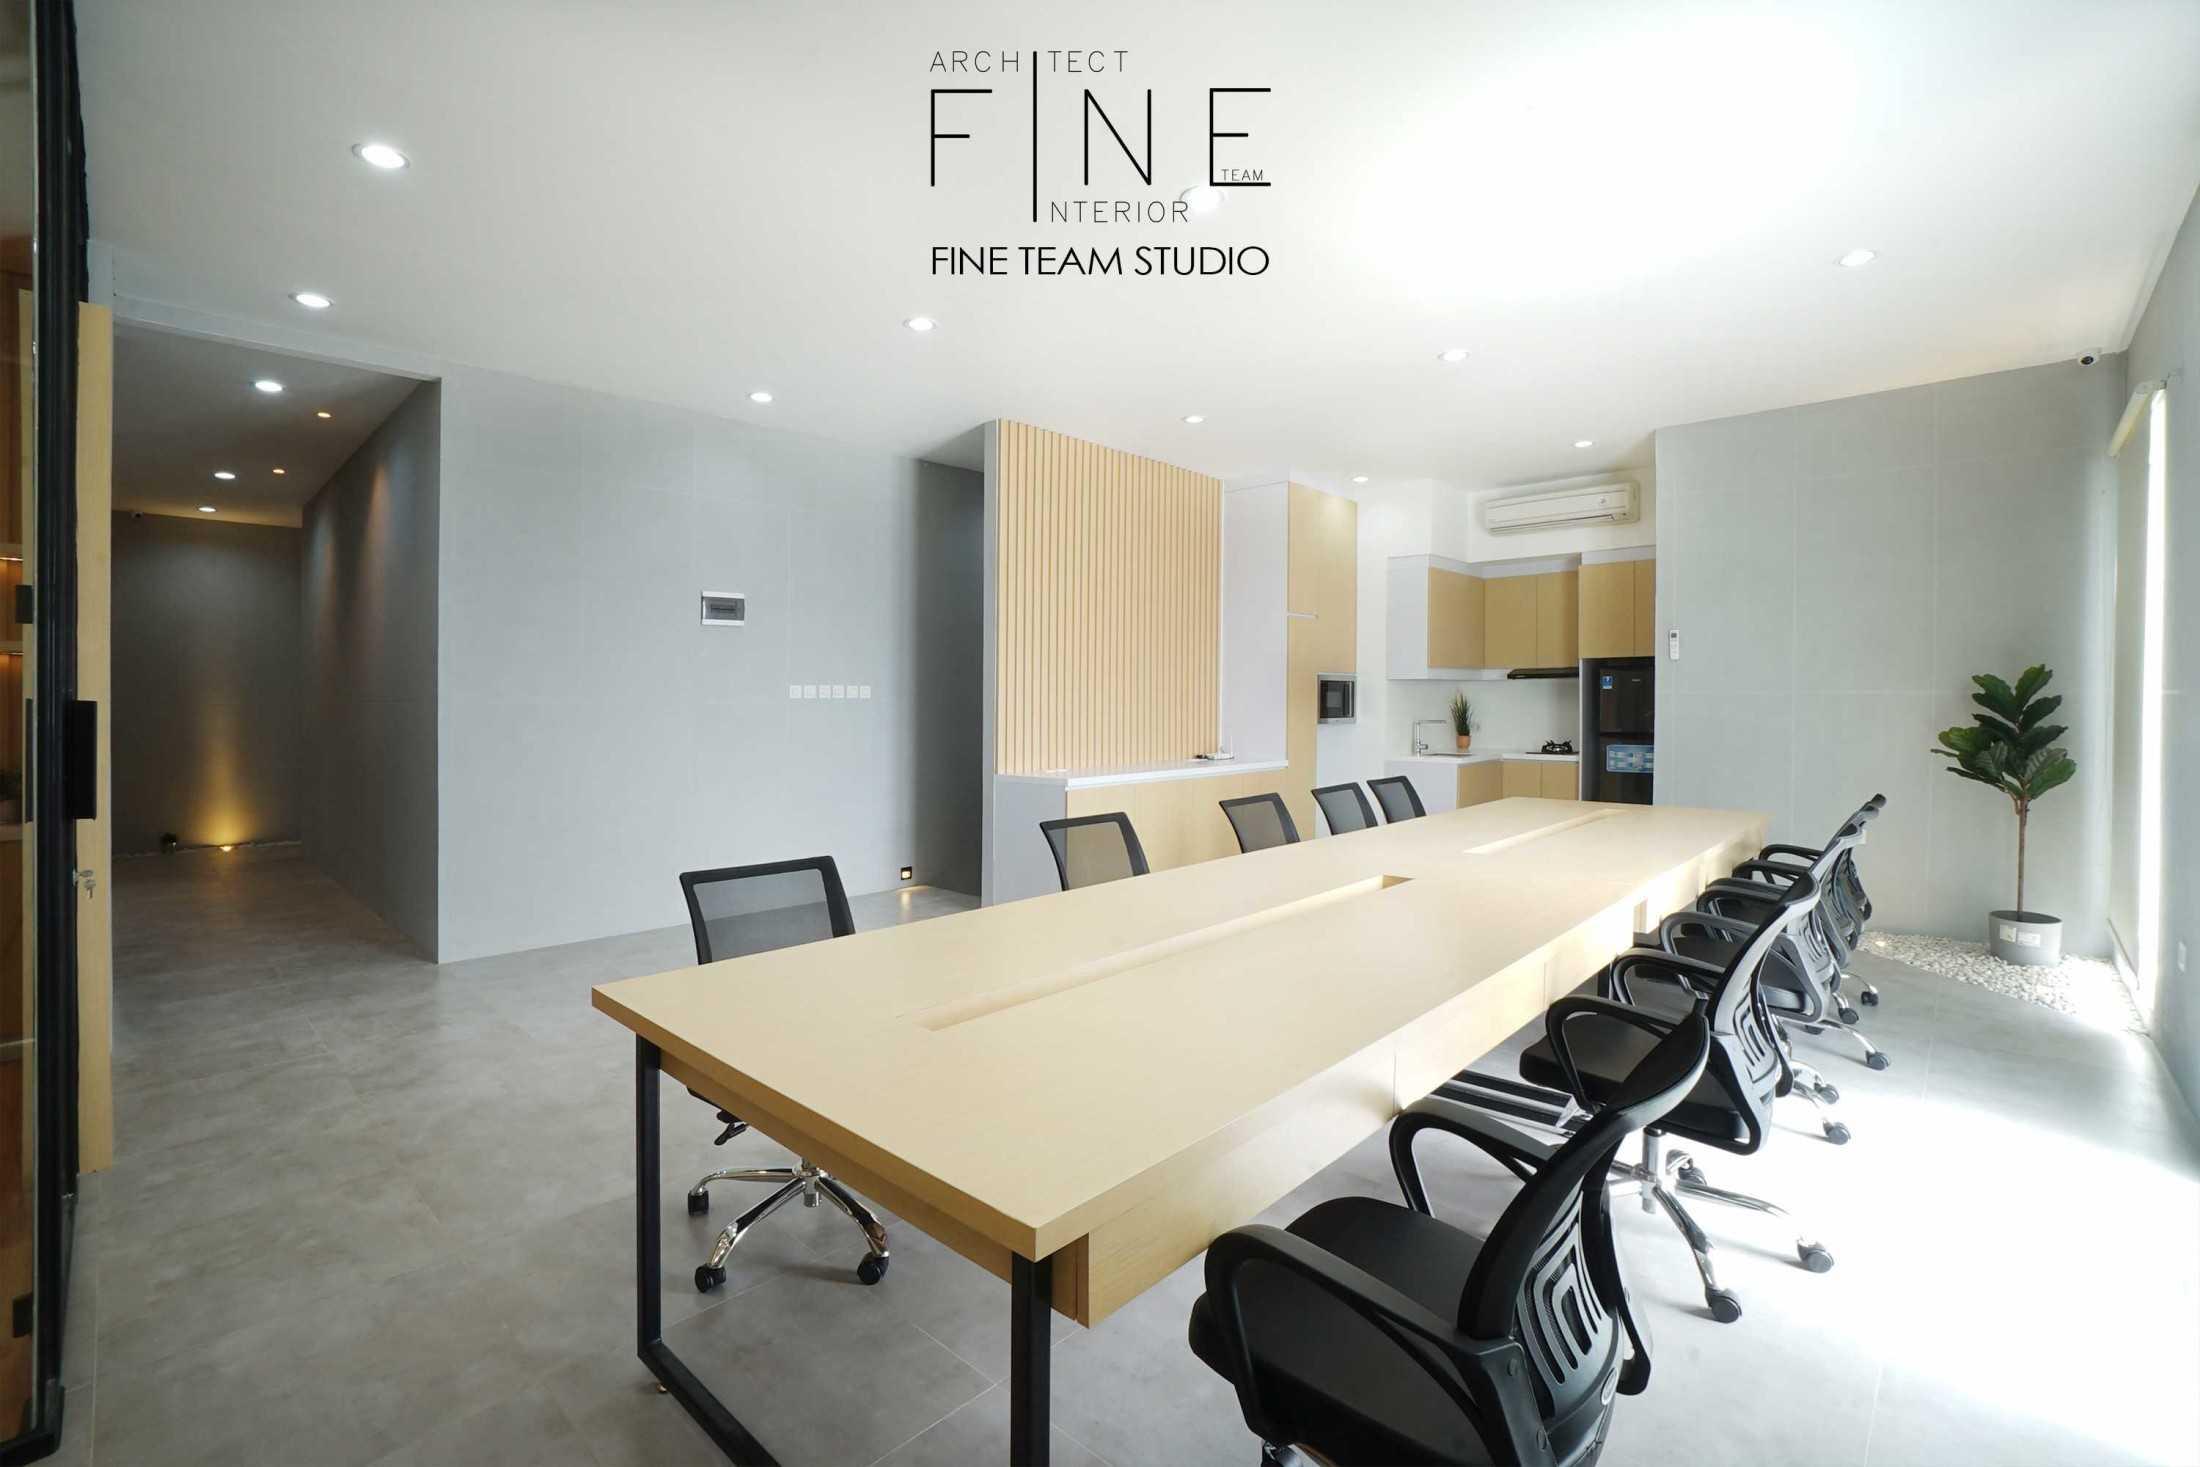 Fine Team Studio Mob Office Cikupa, Tangerang, Banten, Indonesia Cikupa, Tangerang, Banten, Indonesia Fine-Team-Studio-Mob-Office  71135